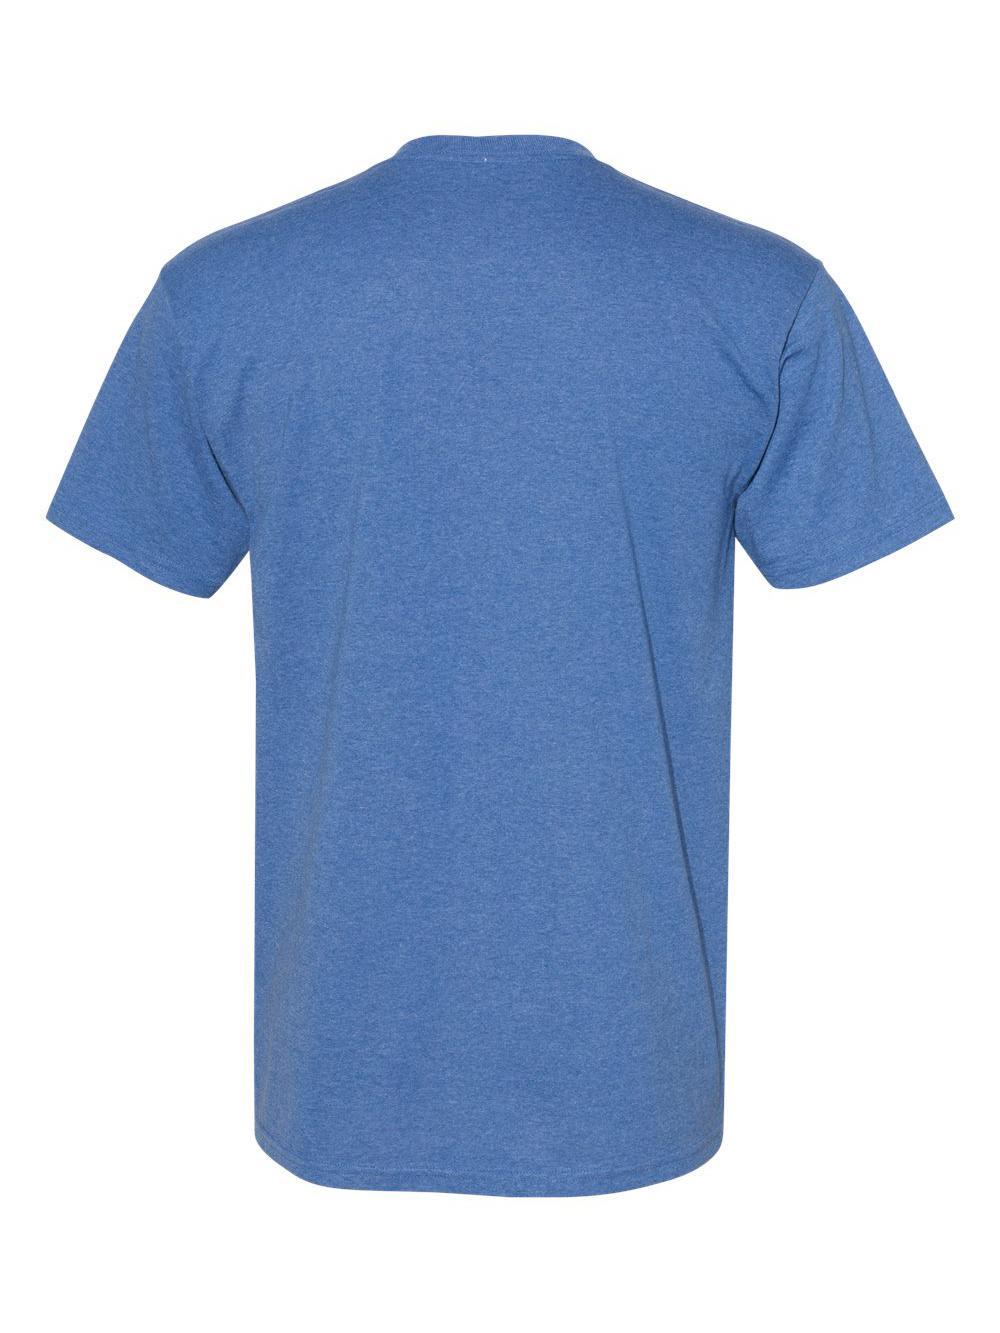 ALSTYLE-Premium-T-Shirt-1701 thumbnail 53